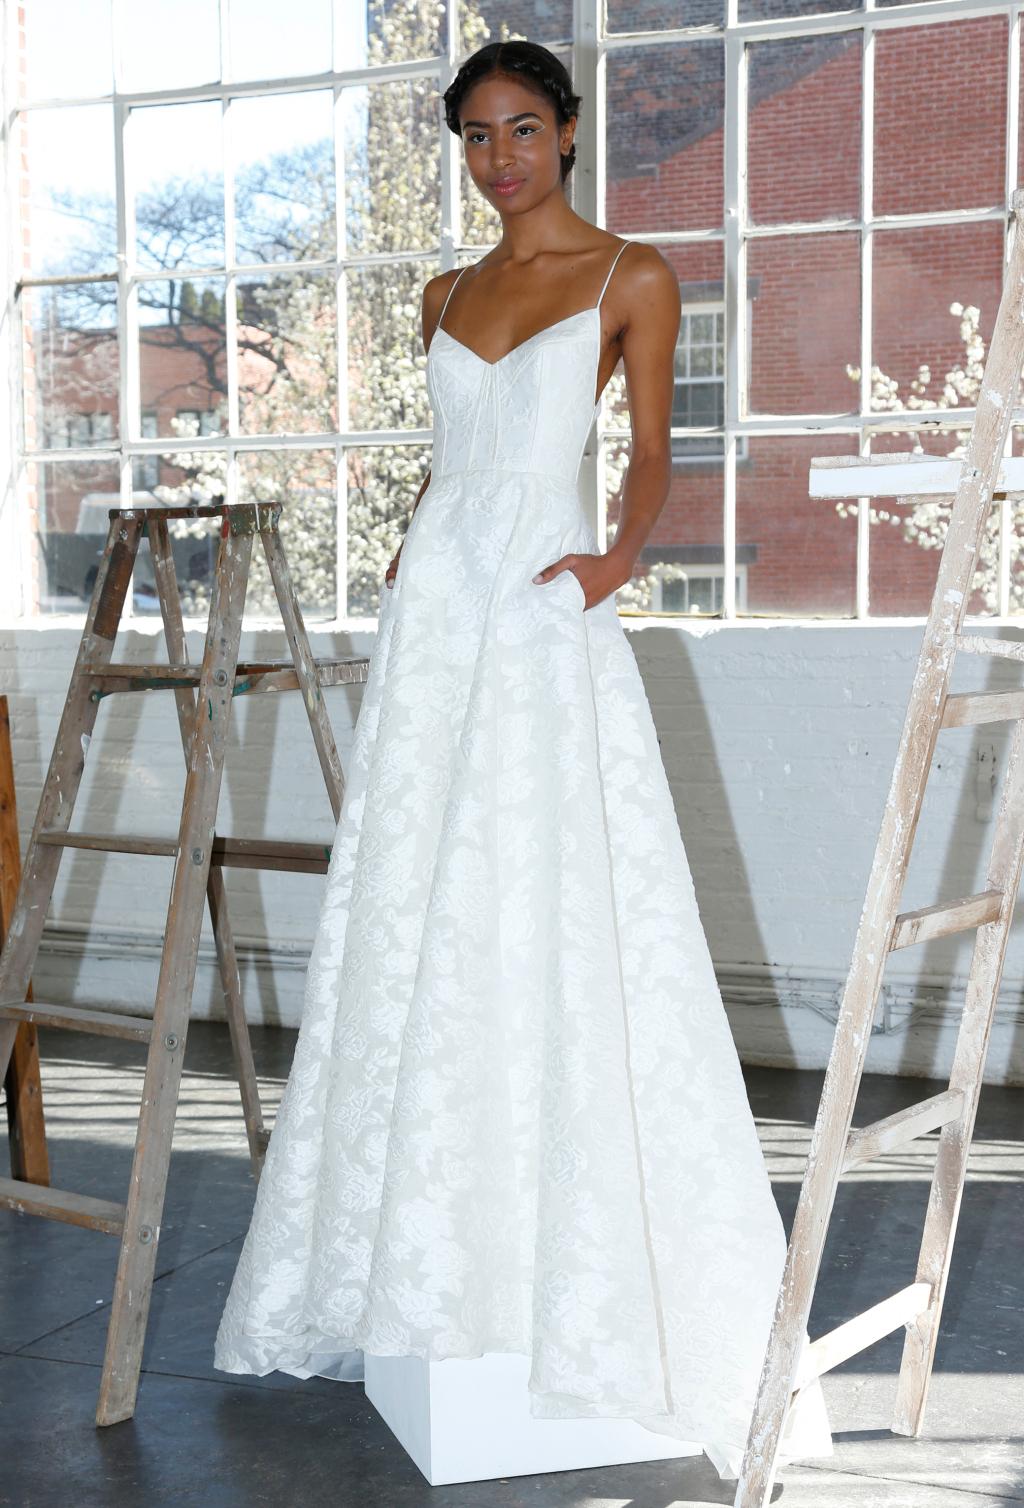 Lela Rose Bridal Gown available via our Nashville Bridal Boutique.Photo via Thomas Iannaccone.